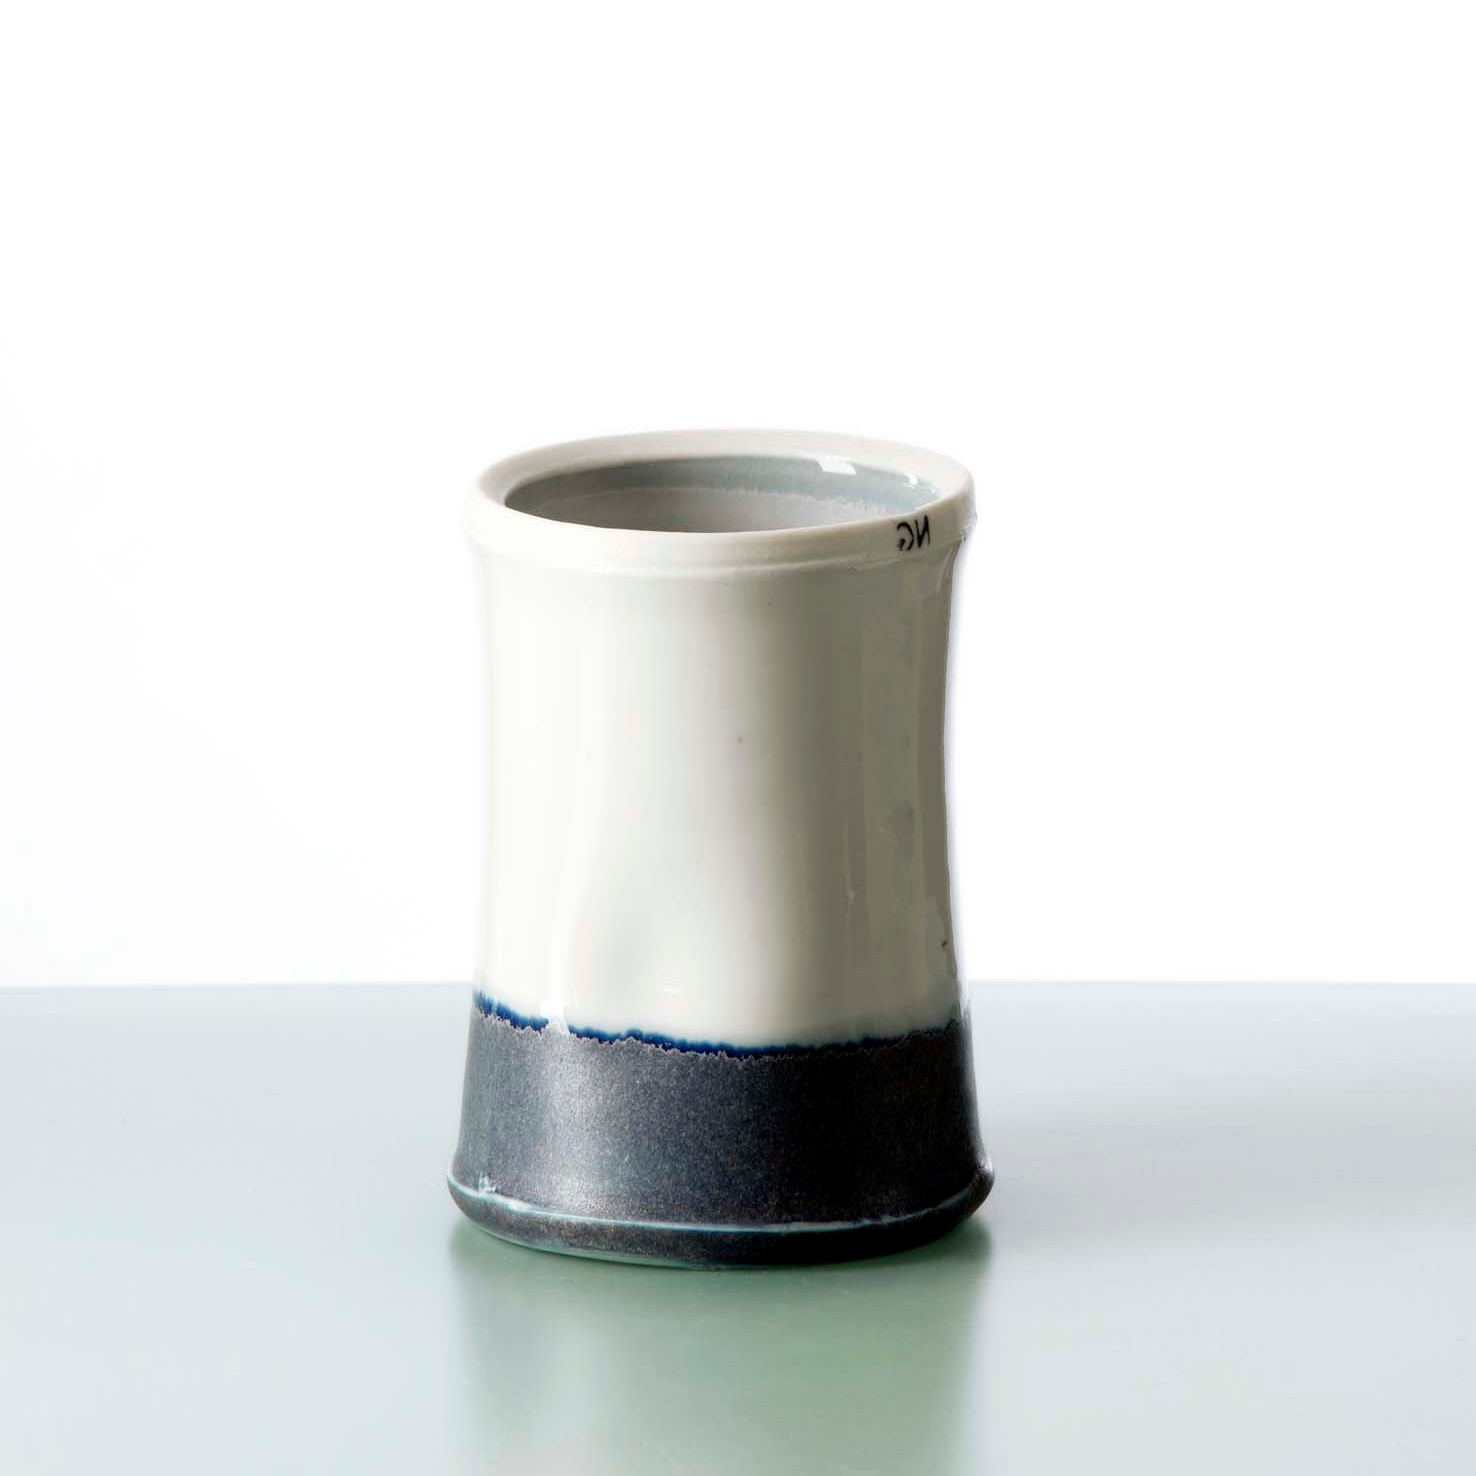 Ninna+G+Keramik_Limfjorden+3_6477lowres.jpg